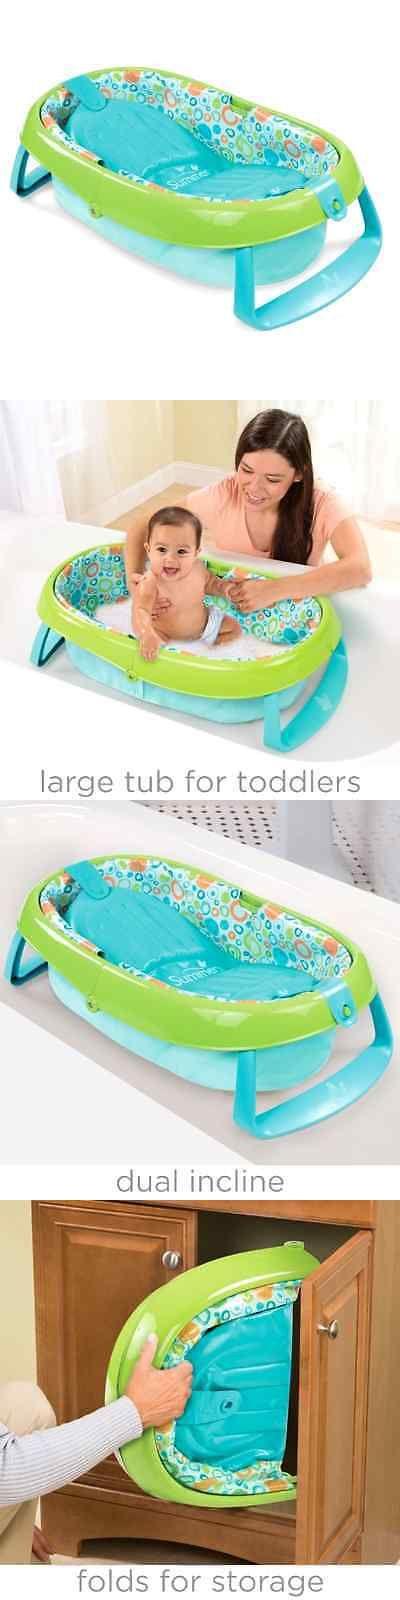 Baby Bath Tub Summer Infant Toddler Compactly folds Bathroom Storage ...